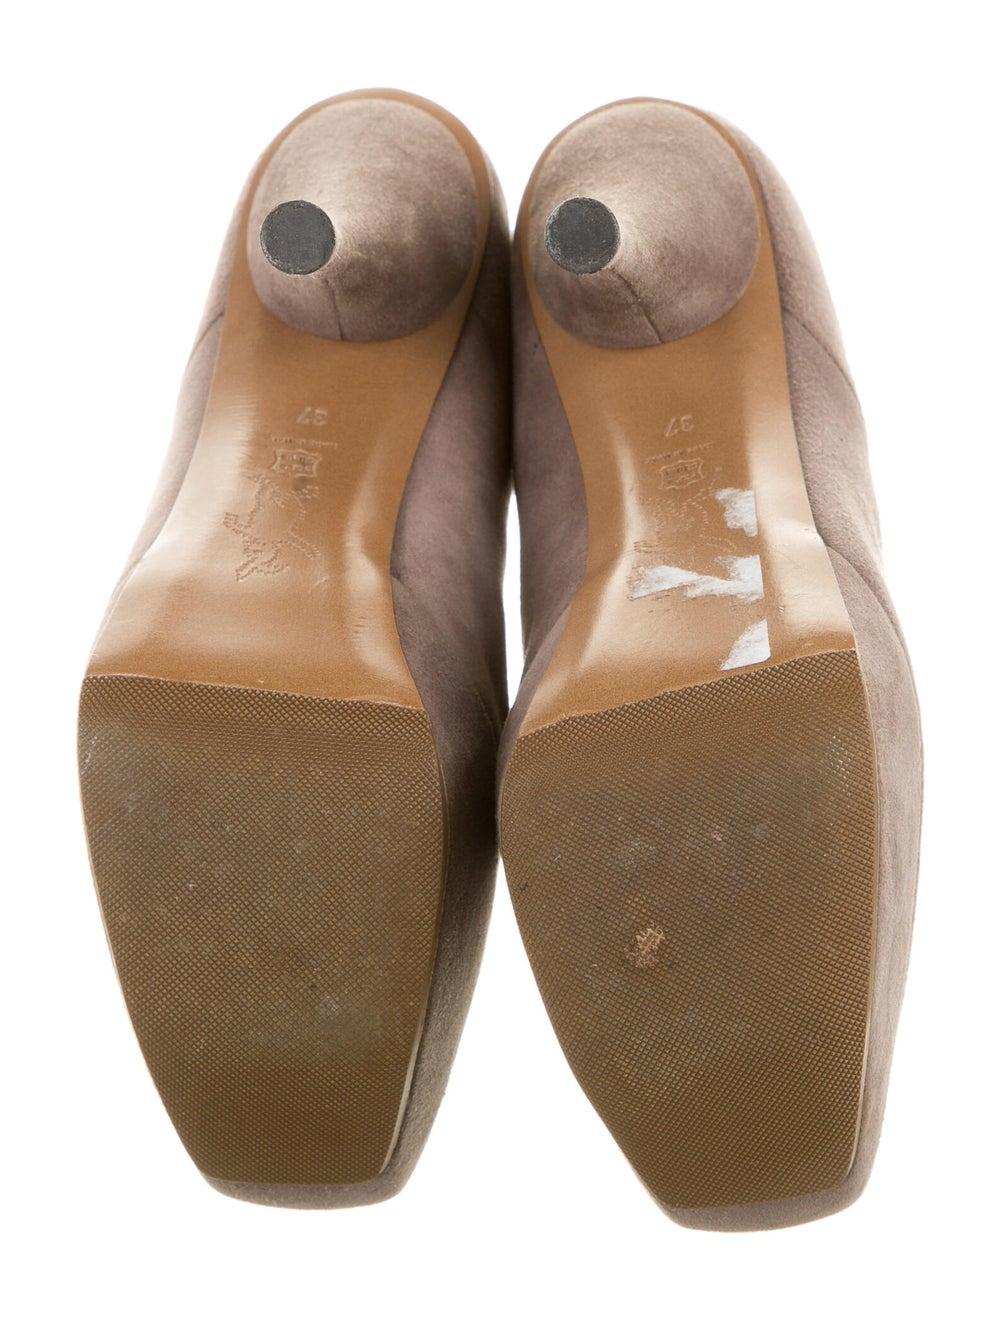 Marni Boots - image 5